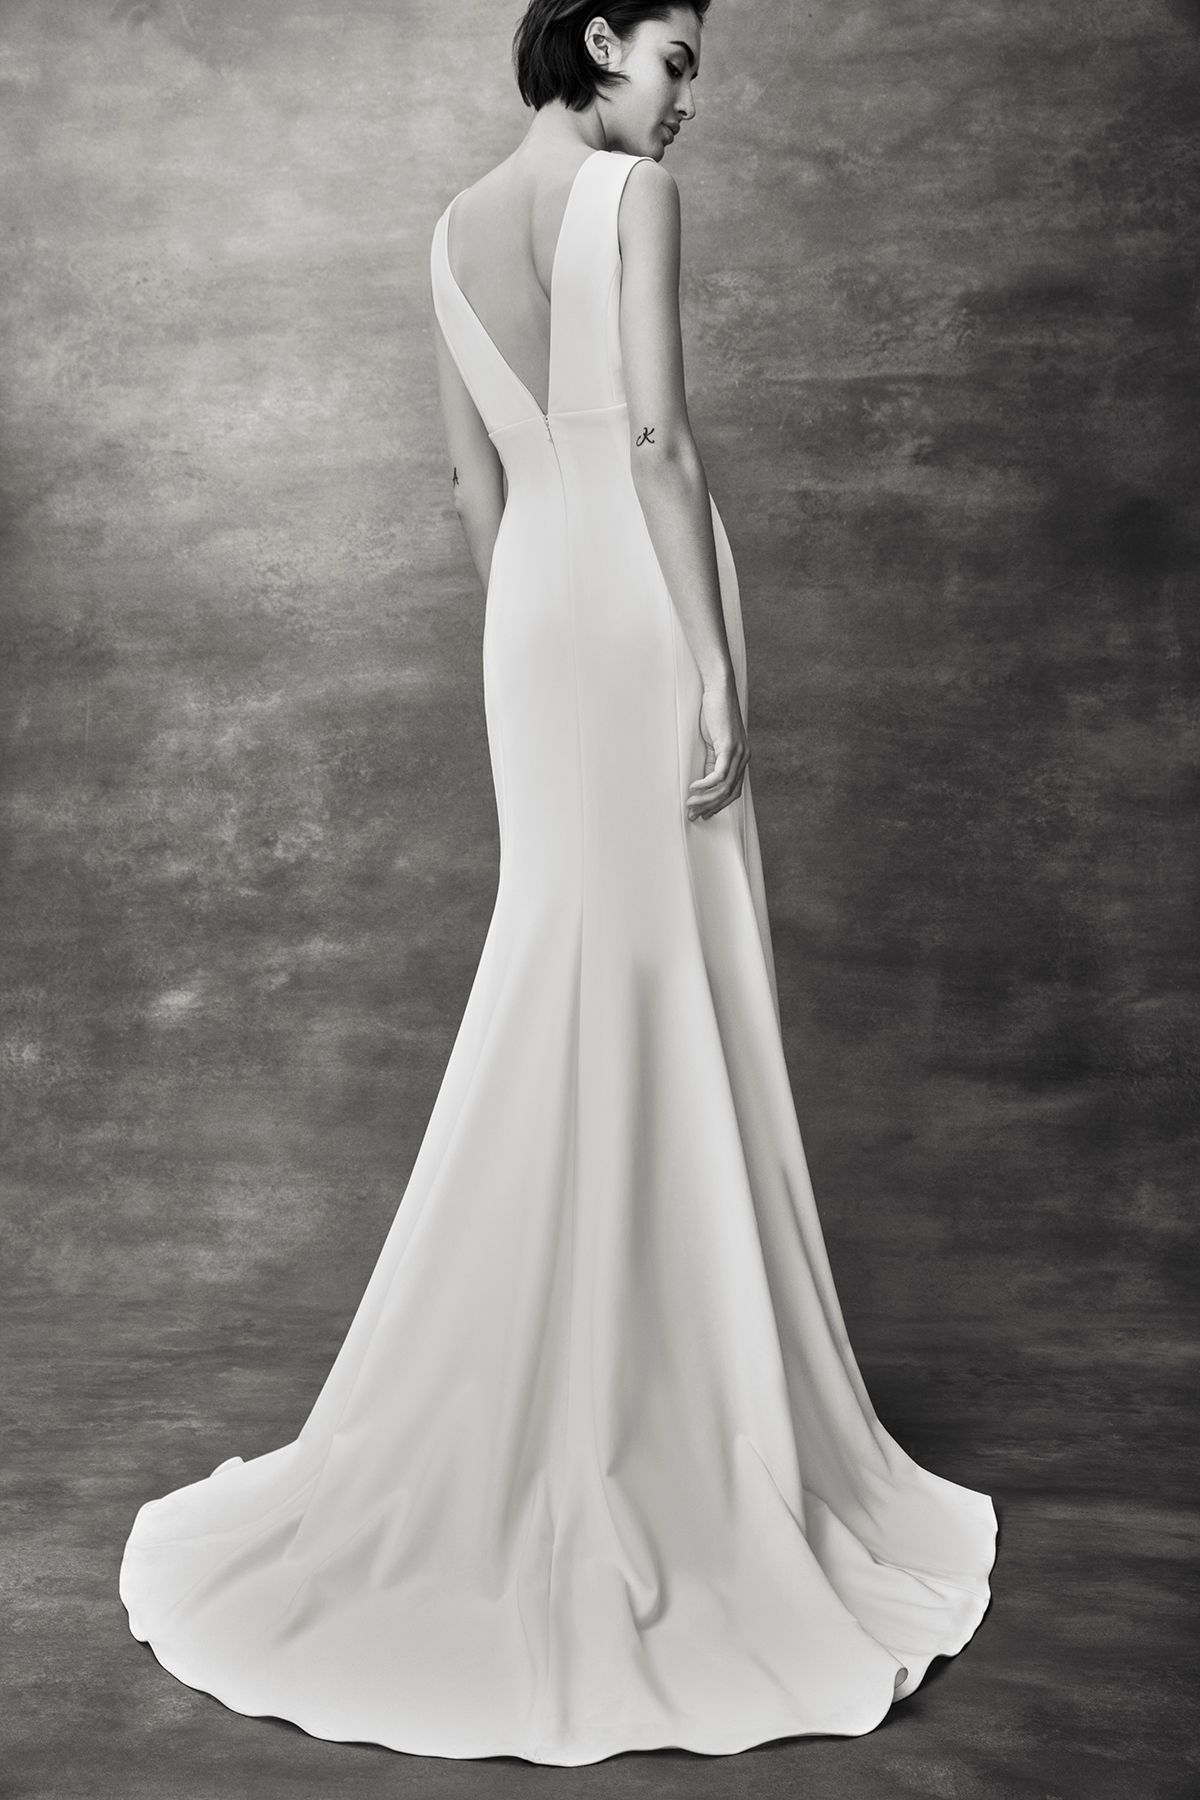 Best wedding dresses for short waisted  Heidi Klum Had The Best Halloween Costume  Wedding Dresses